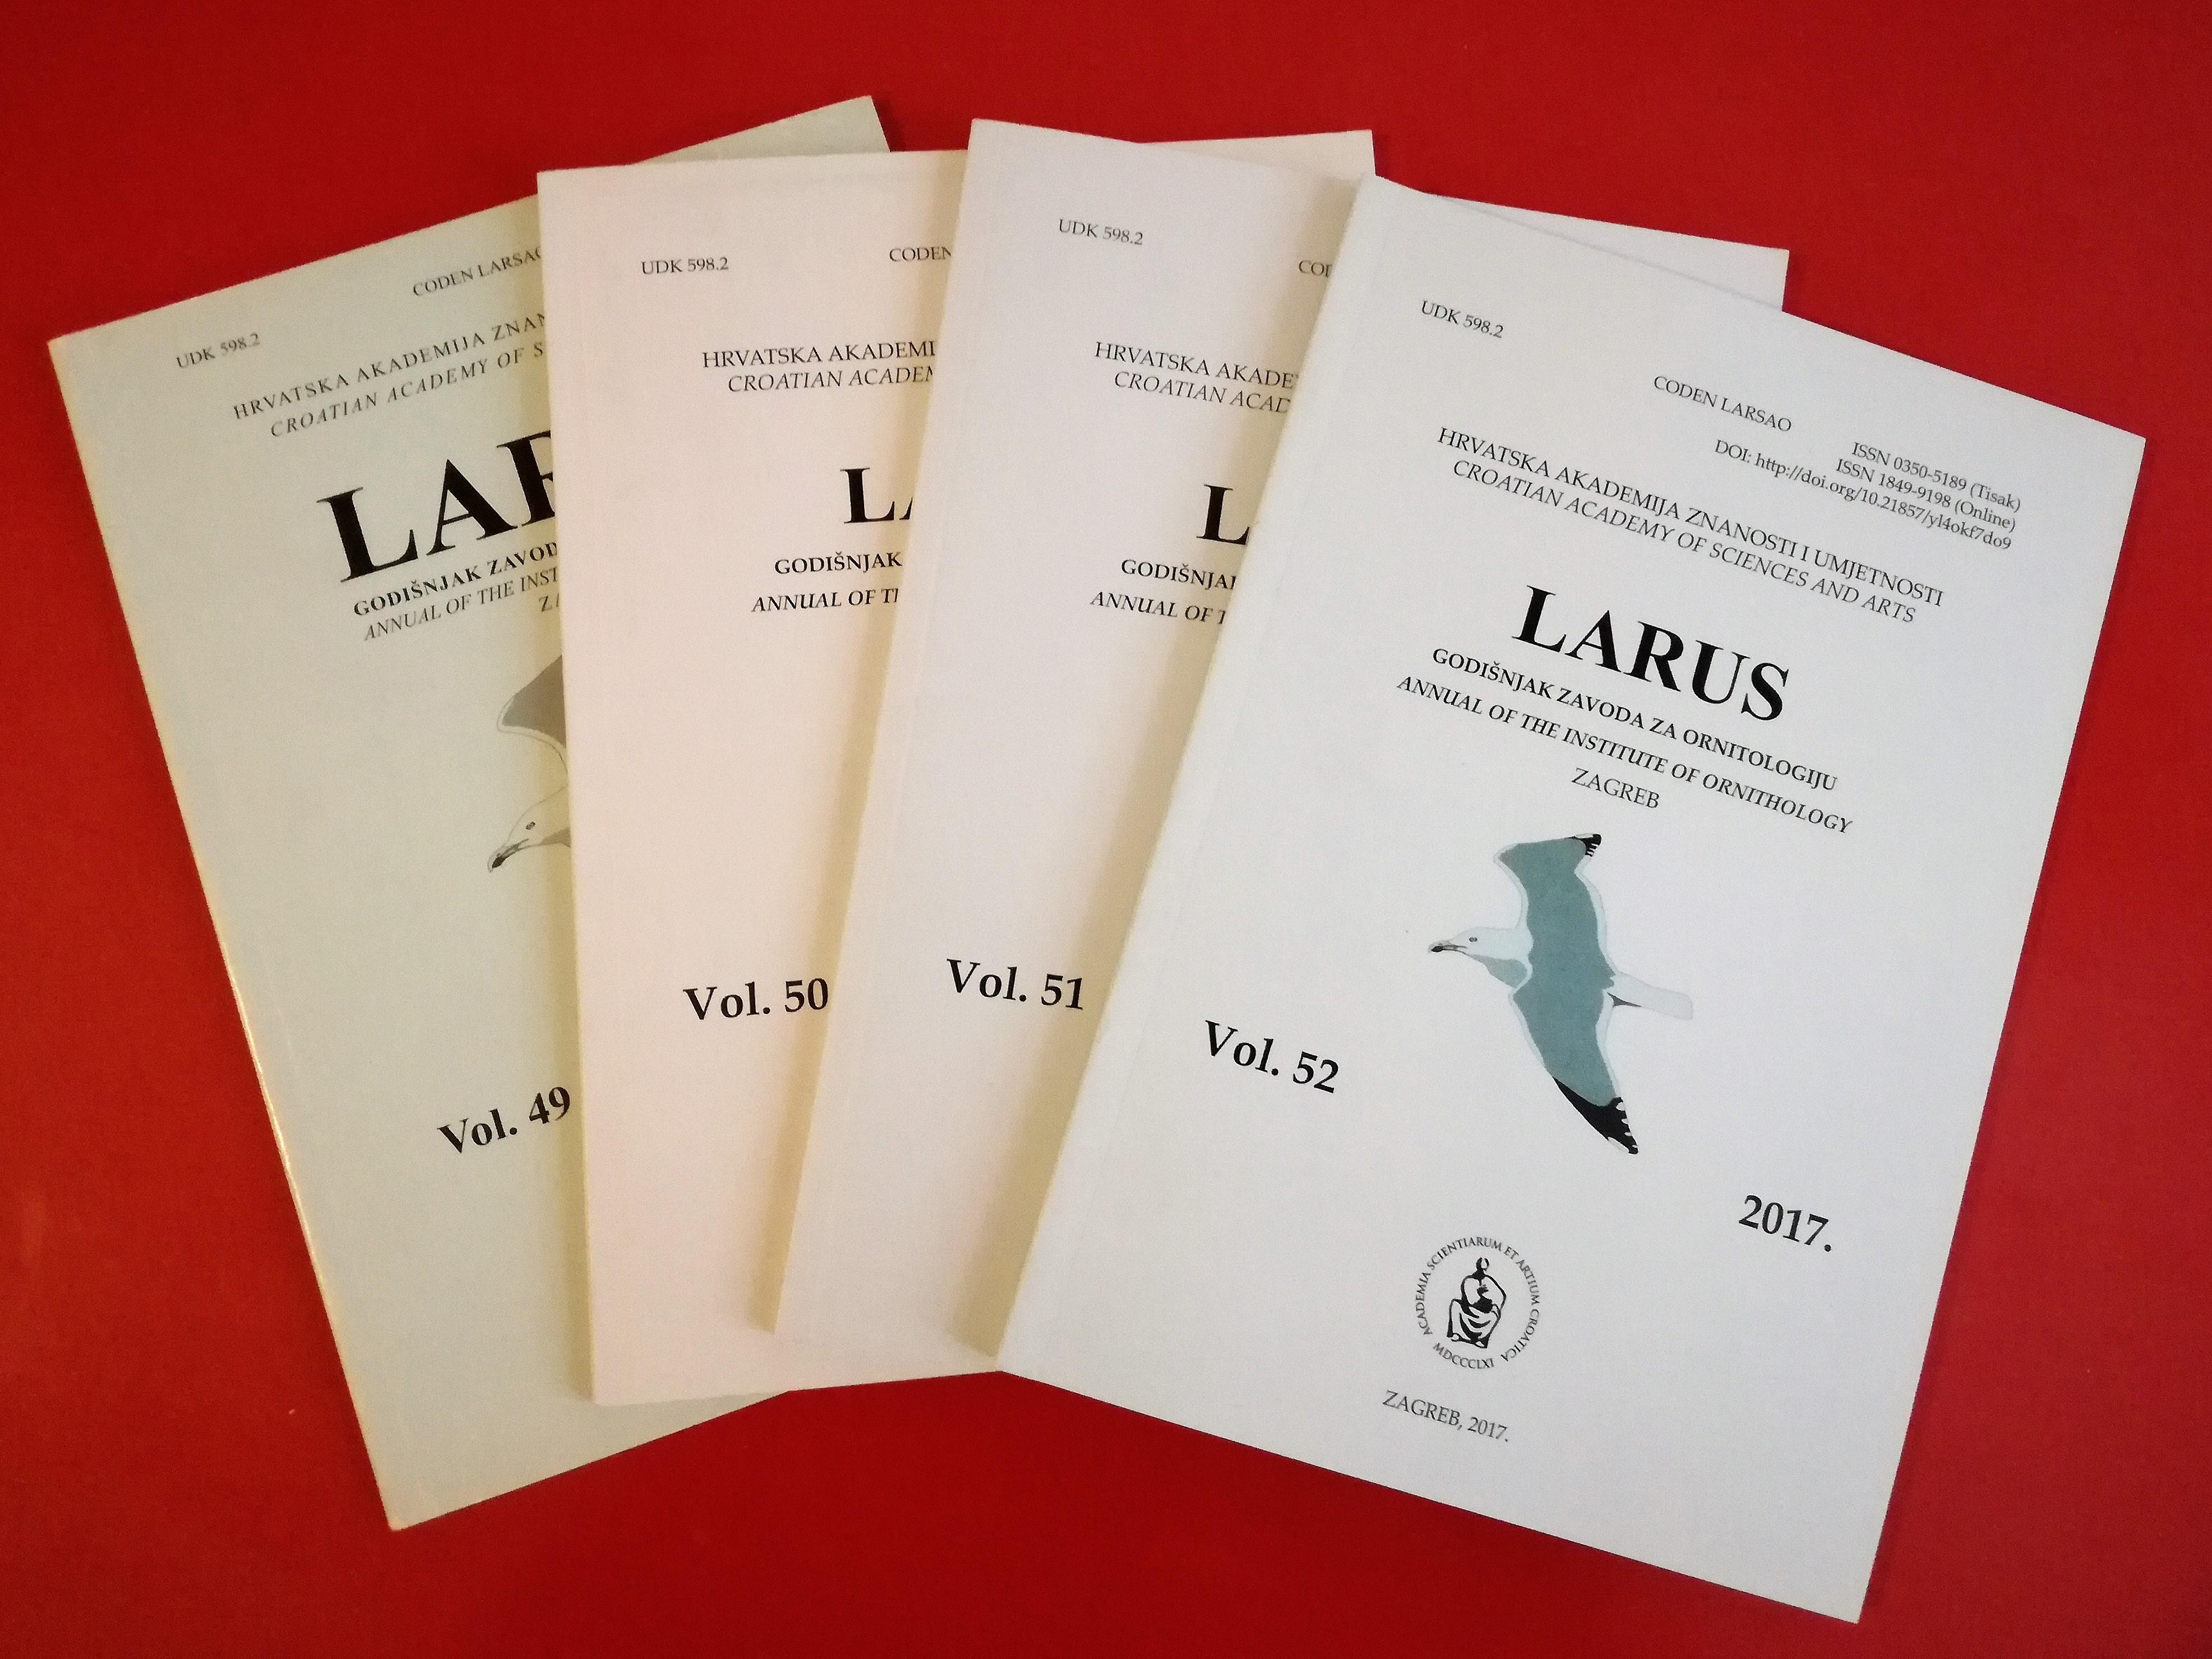 Časopis Larus Vol. 52 dostupan za preuzimanje